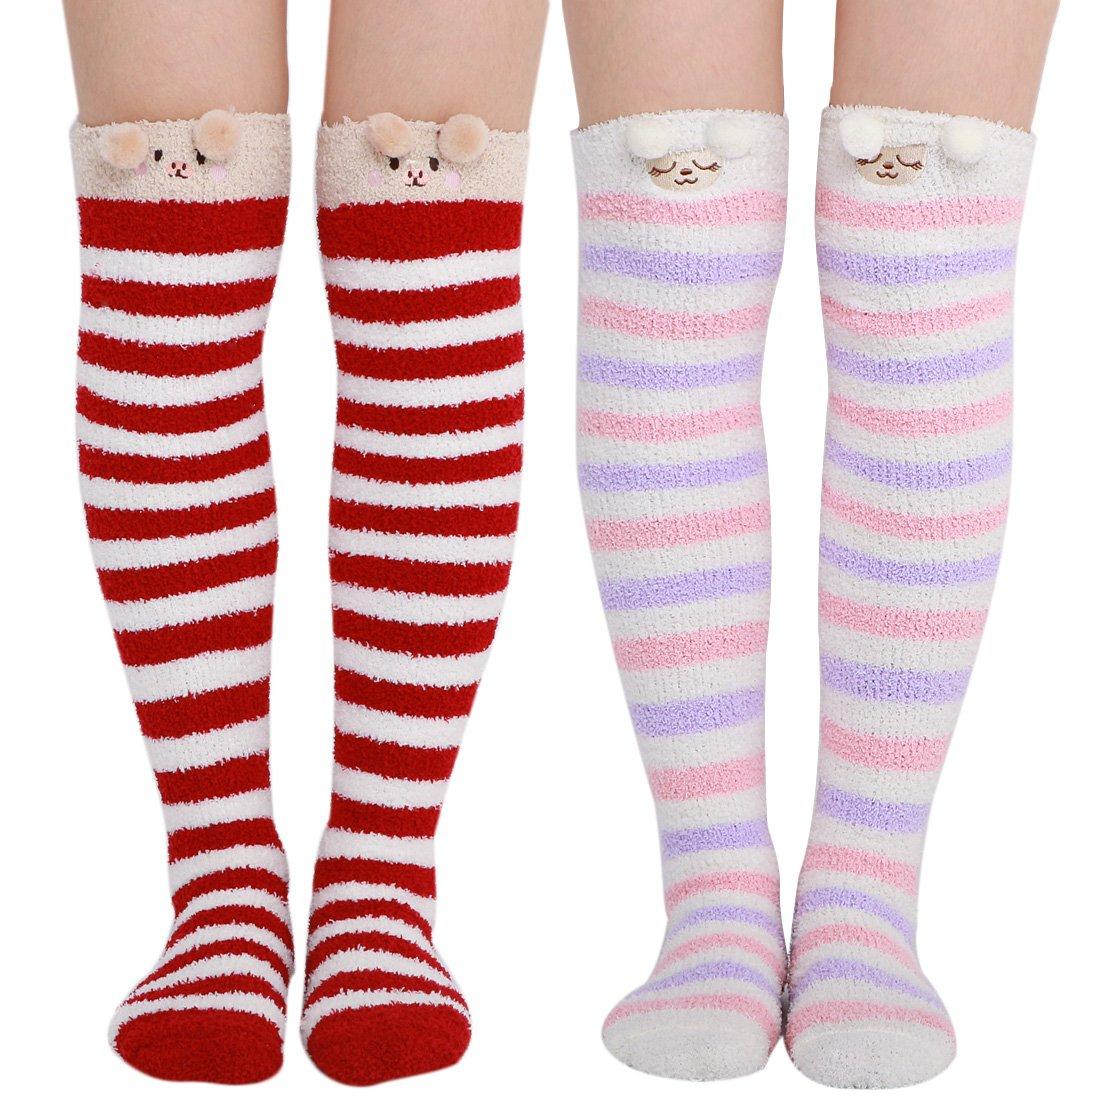 kilofly 2 Pairs Women's Soft Thick Warm Over Calf Knee High Animal Cartoon Socks FTW522set2